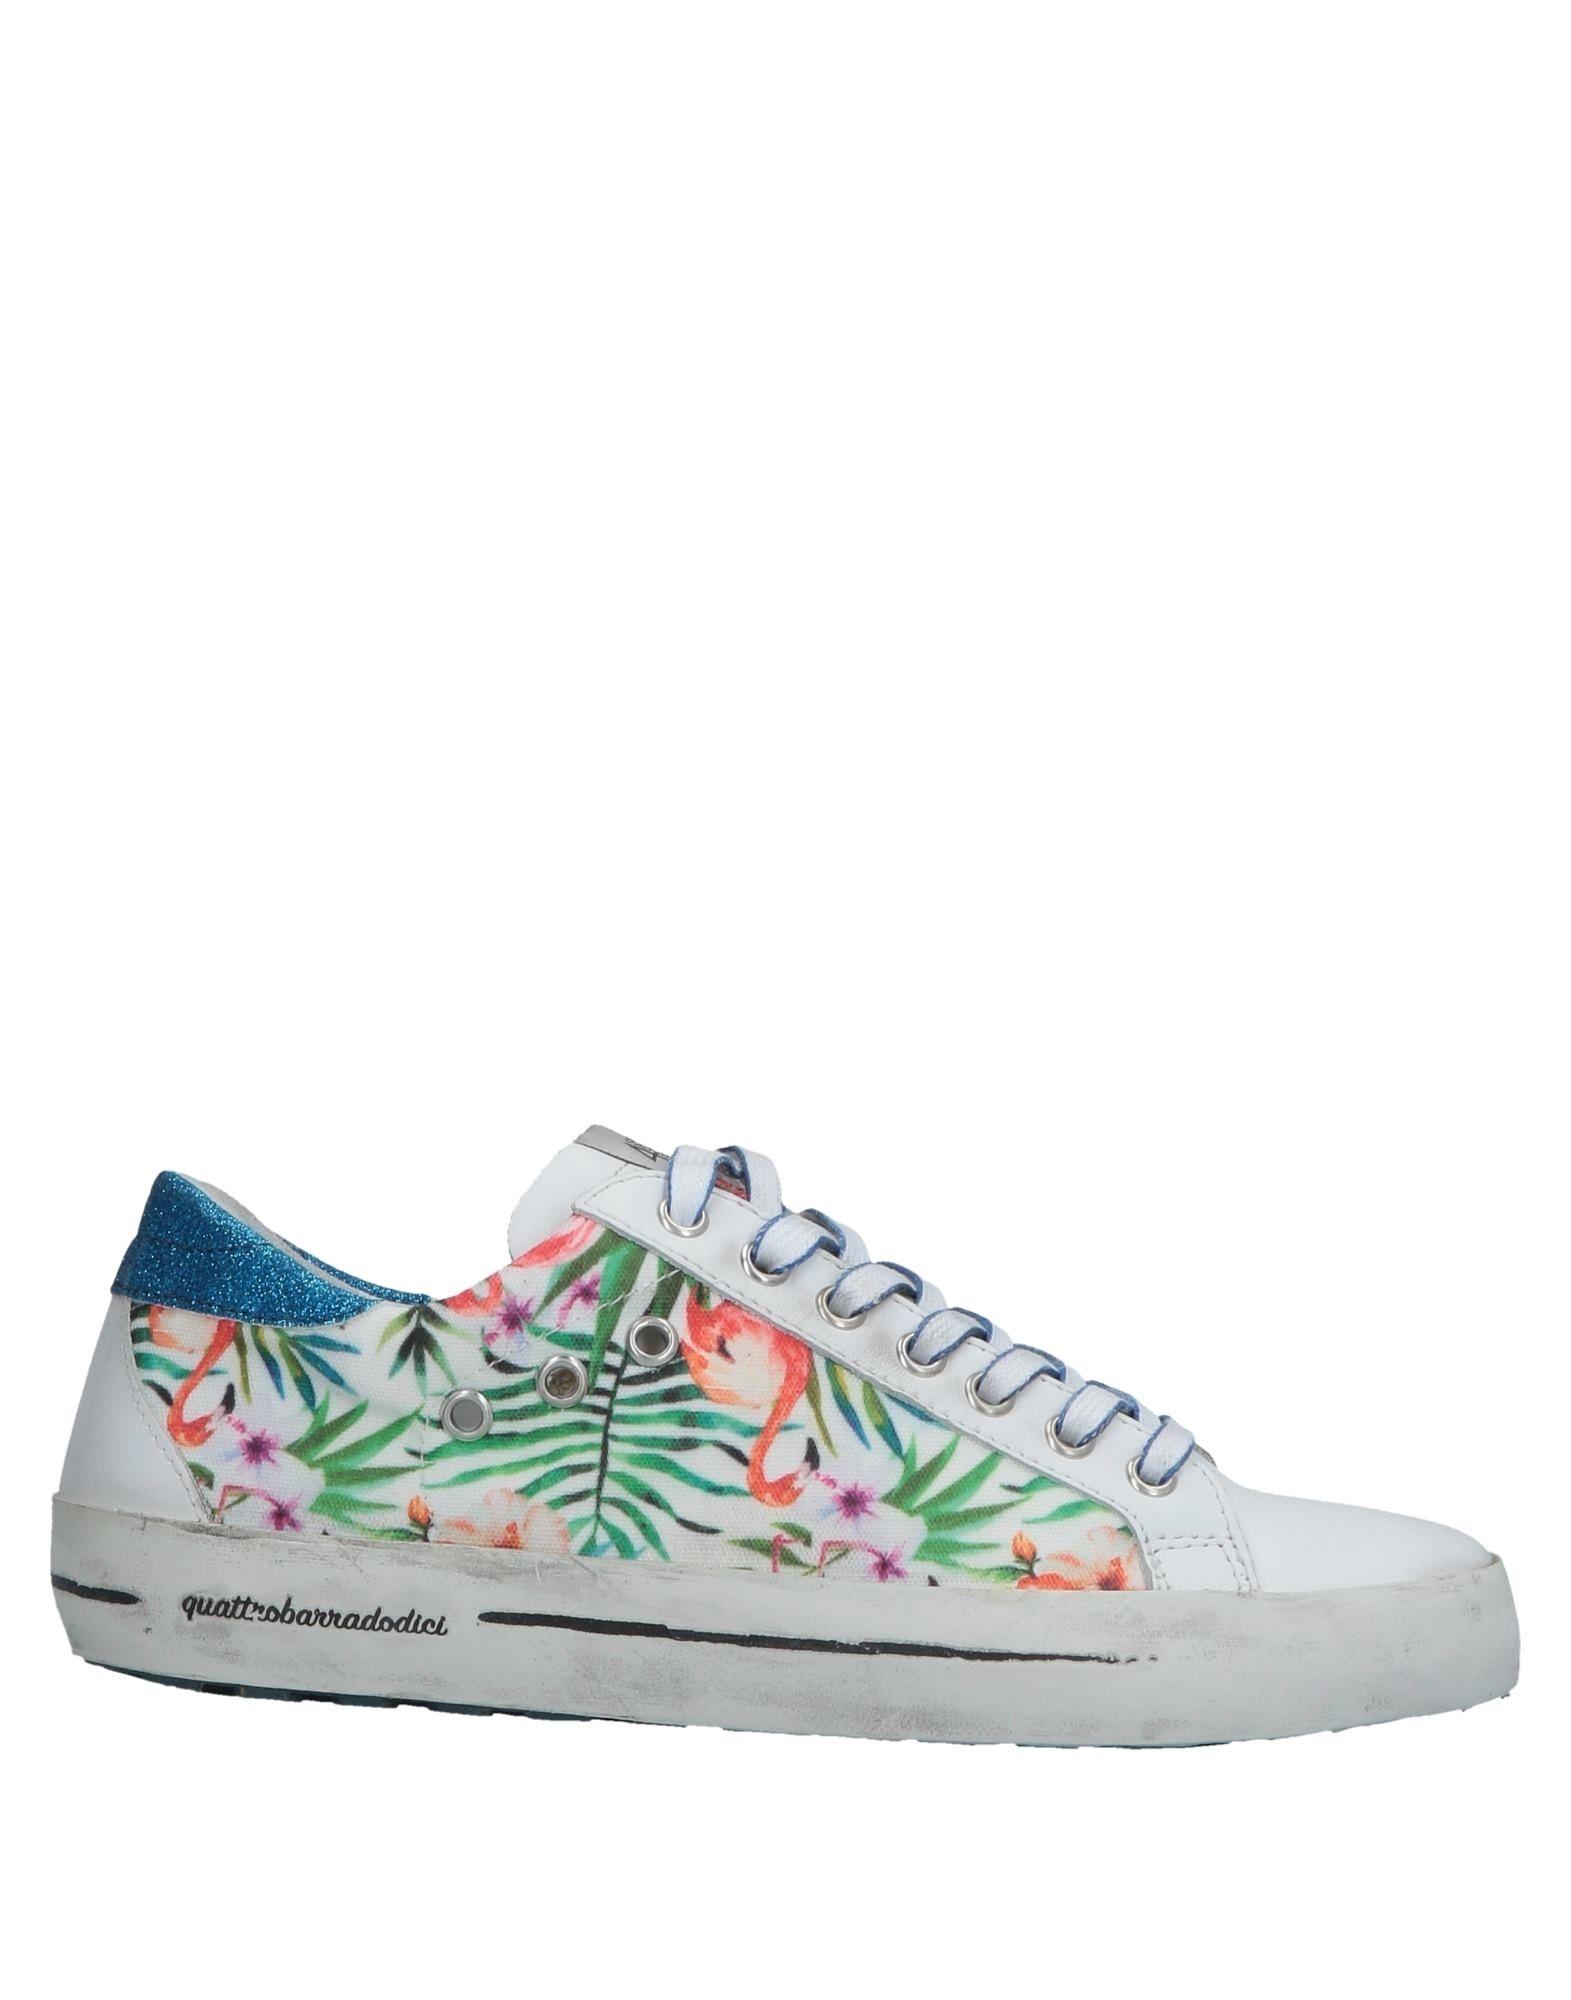 Quattrobarradodici on Sneakers - Women Quattrobarradodici Sneakers online on Quattrobarradodici  Canada - 11573536QJ d194ef